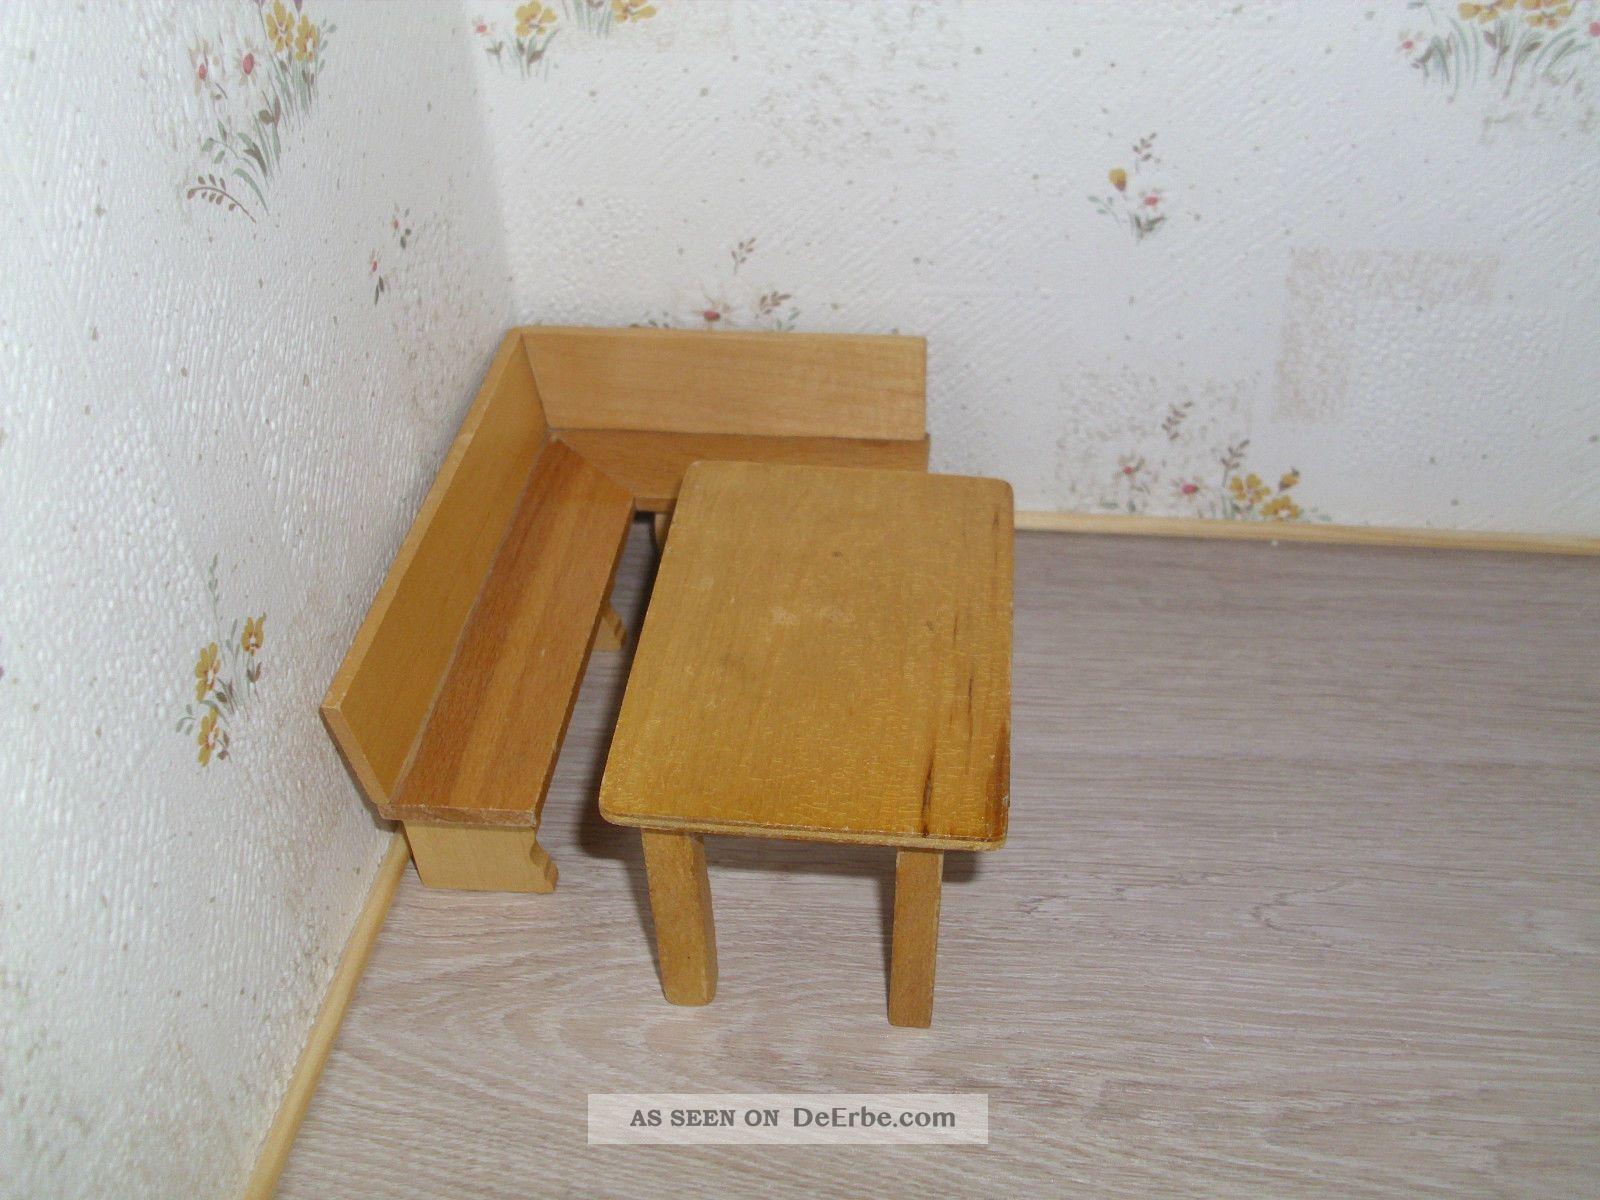 ltere sitzbank eckbank tisch aus holz f r puppenstube puppenk che 1 12. Black Bedroom Furniture Sets. Home Design Ideas